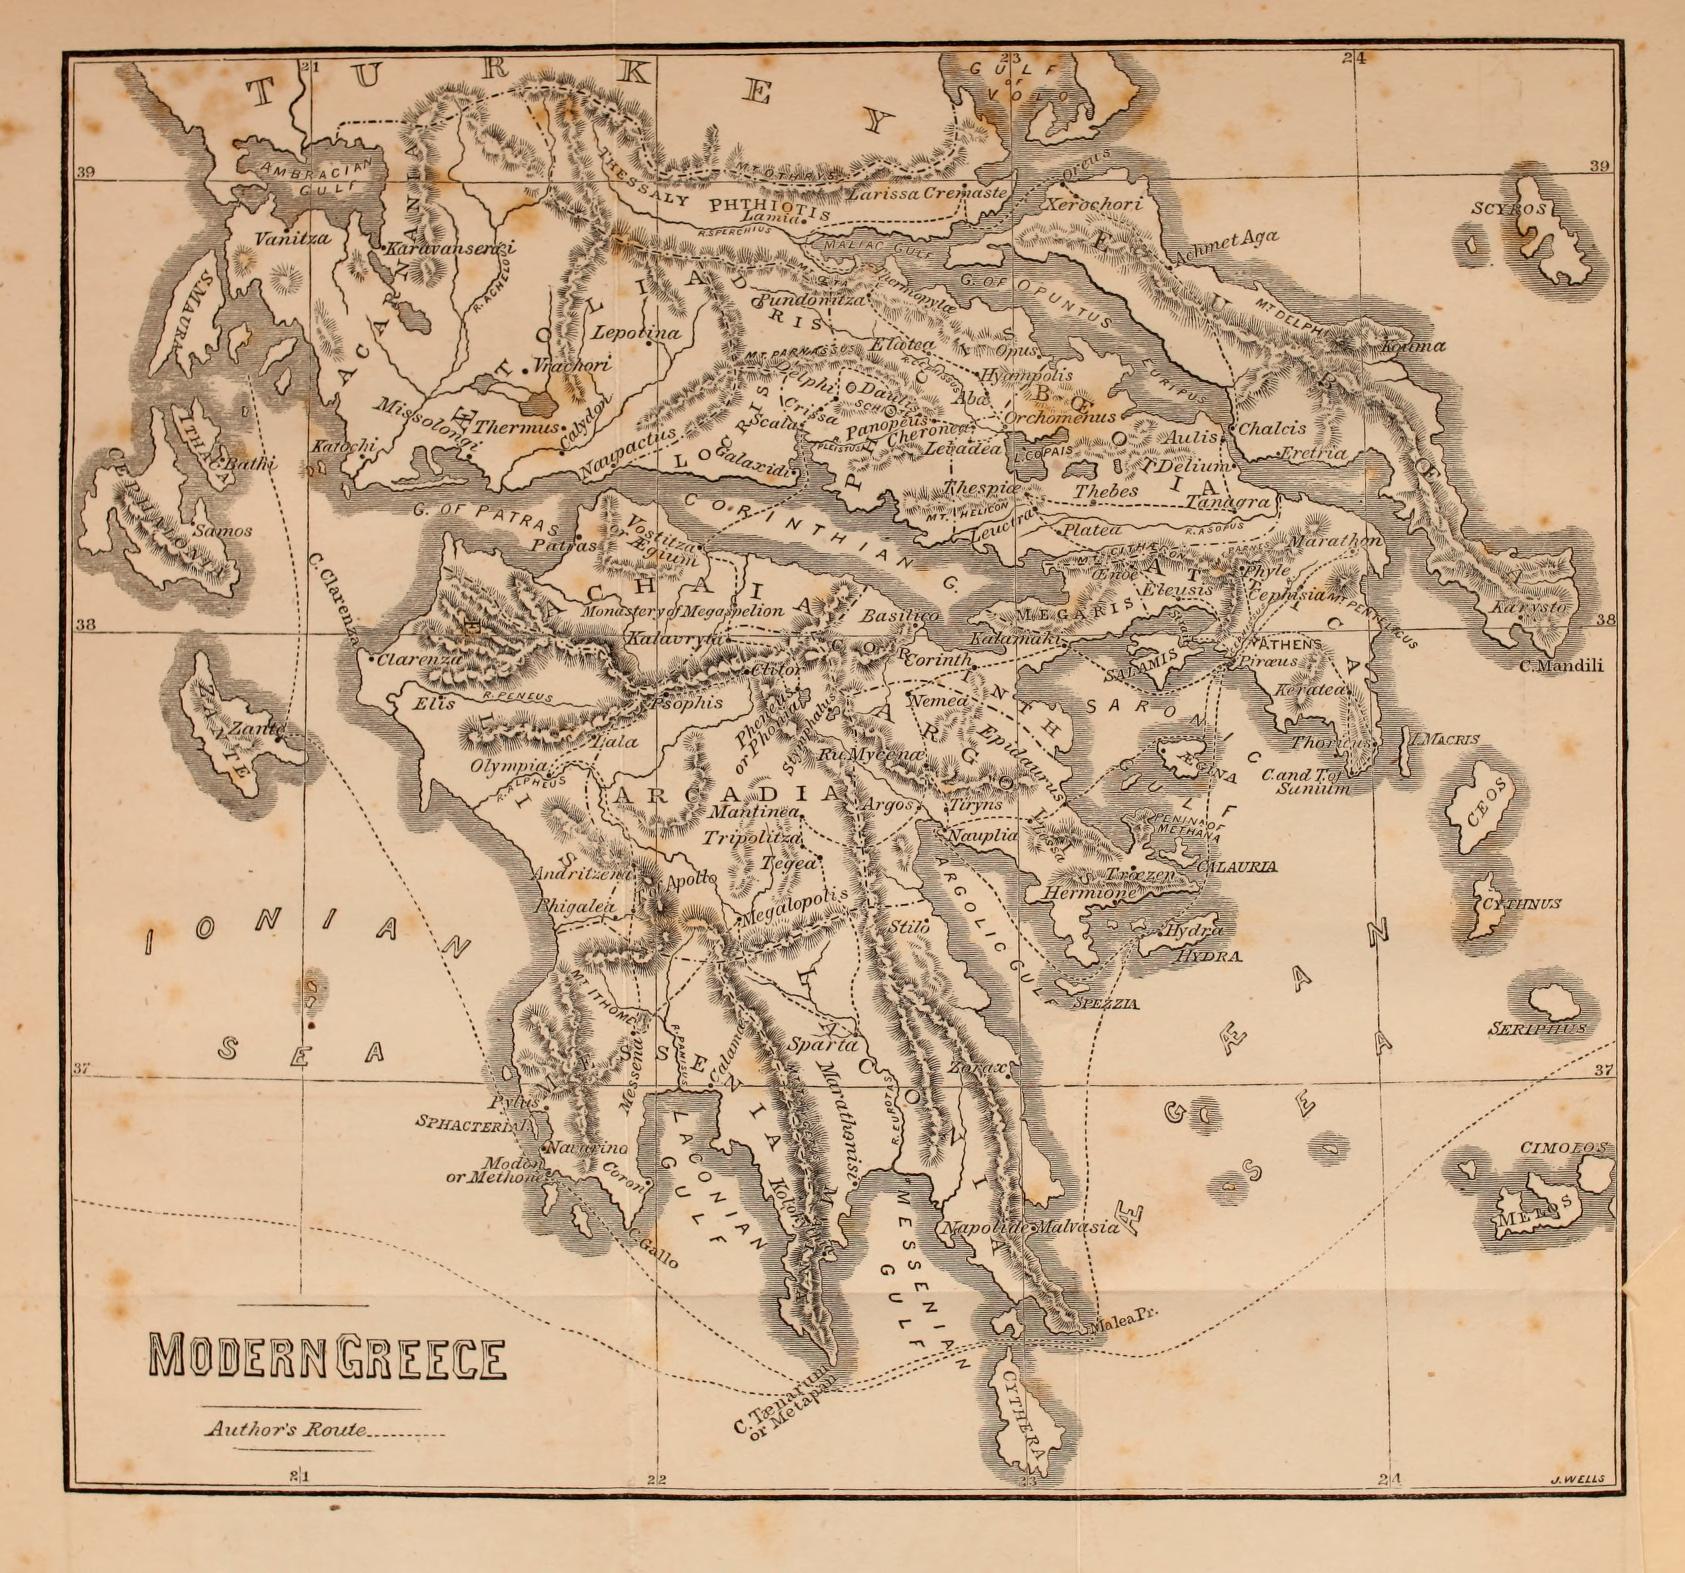 modern greece1_1_1856